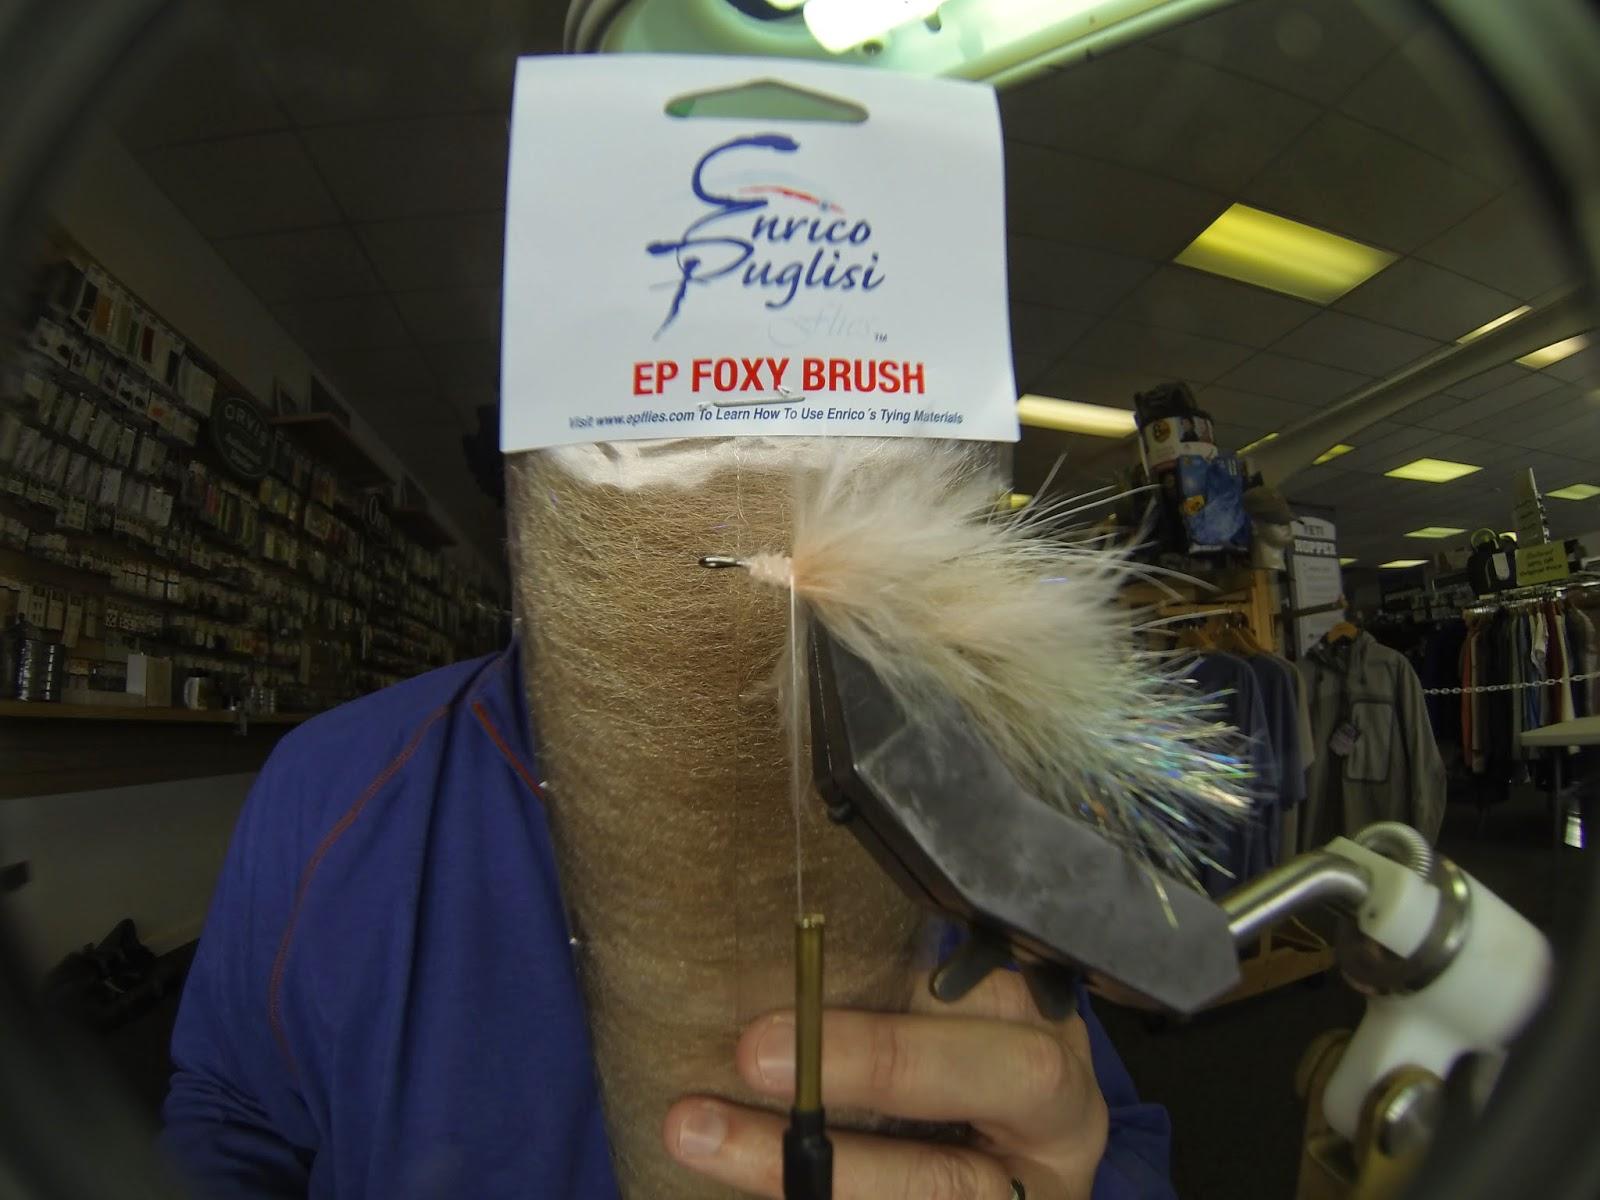 http://www.castersonlineflyshop.com/enrico-puglisi-ep-foxy-brush-3/